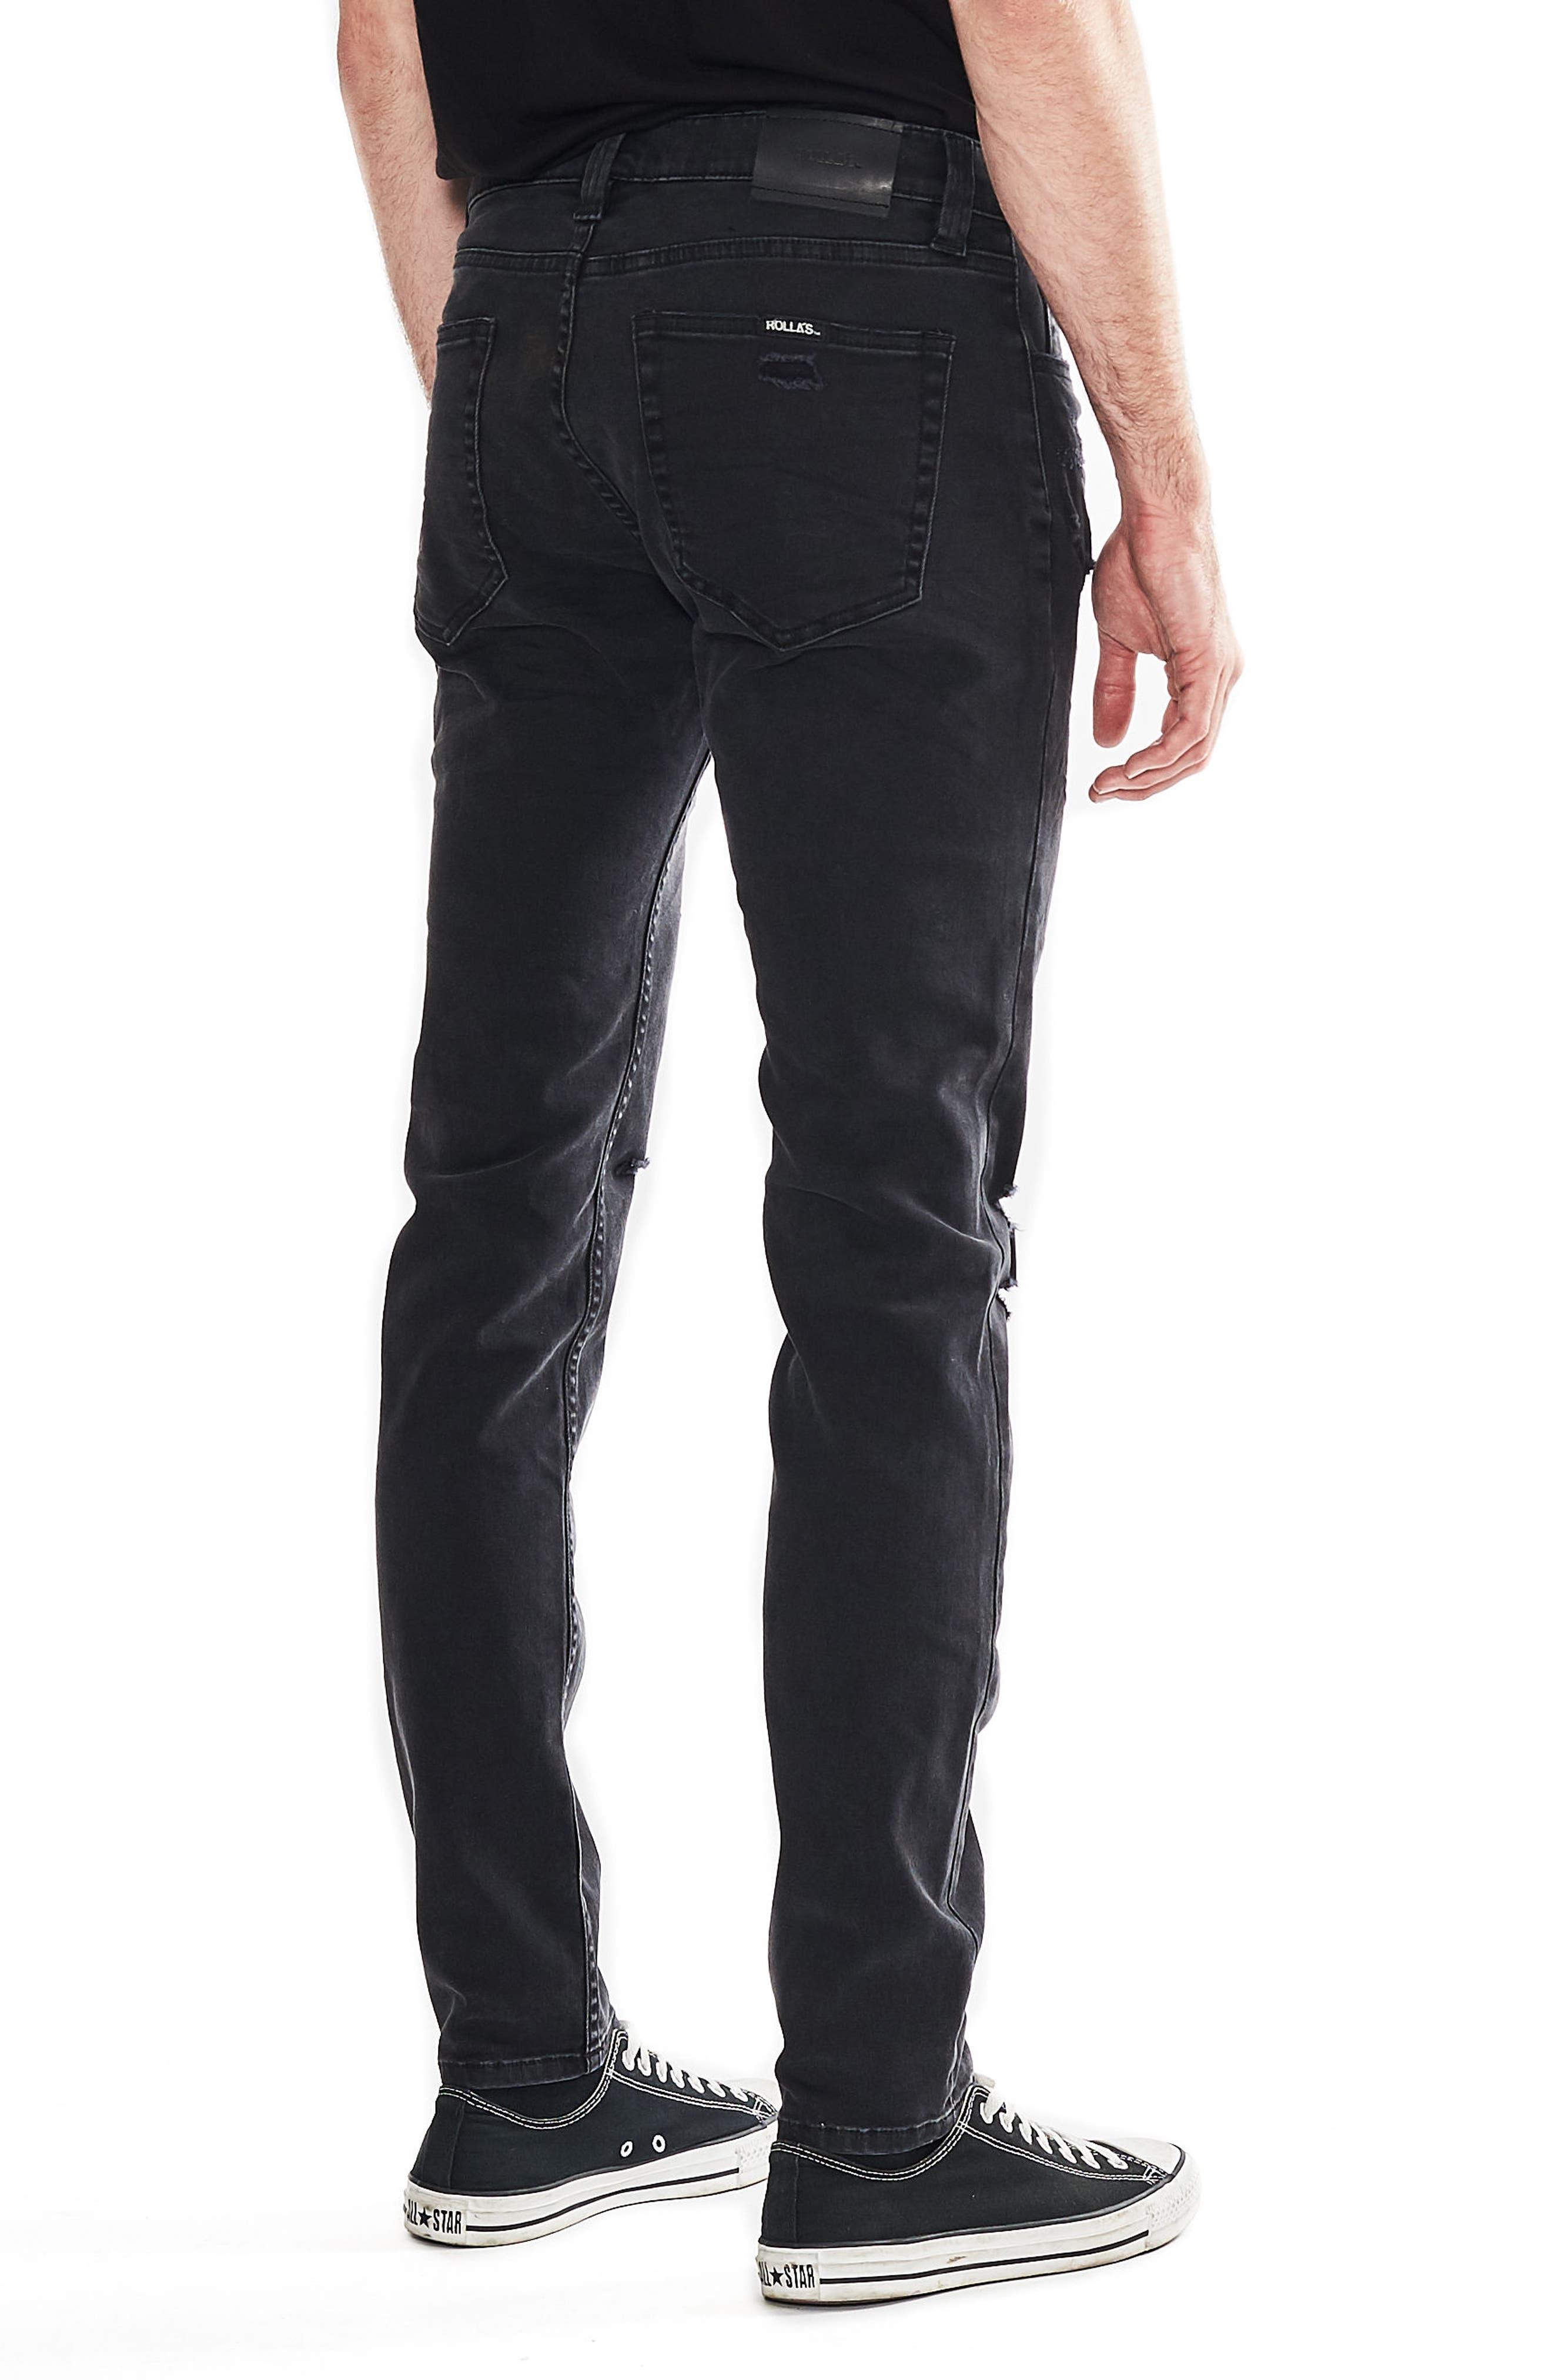 Stinger Skinny Fit Jeans,                             Alternate thumbnail 4, color,                             BLOWOUT BLACK